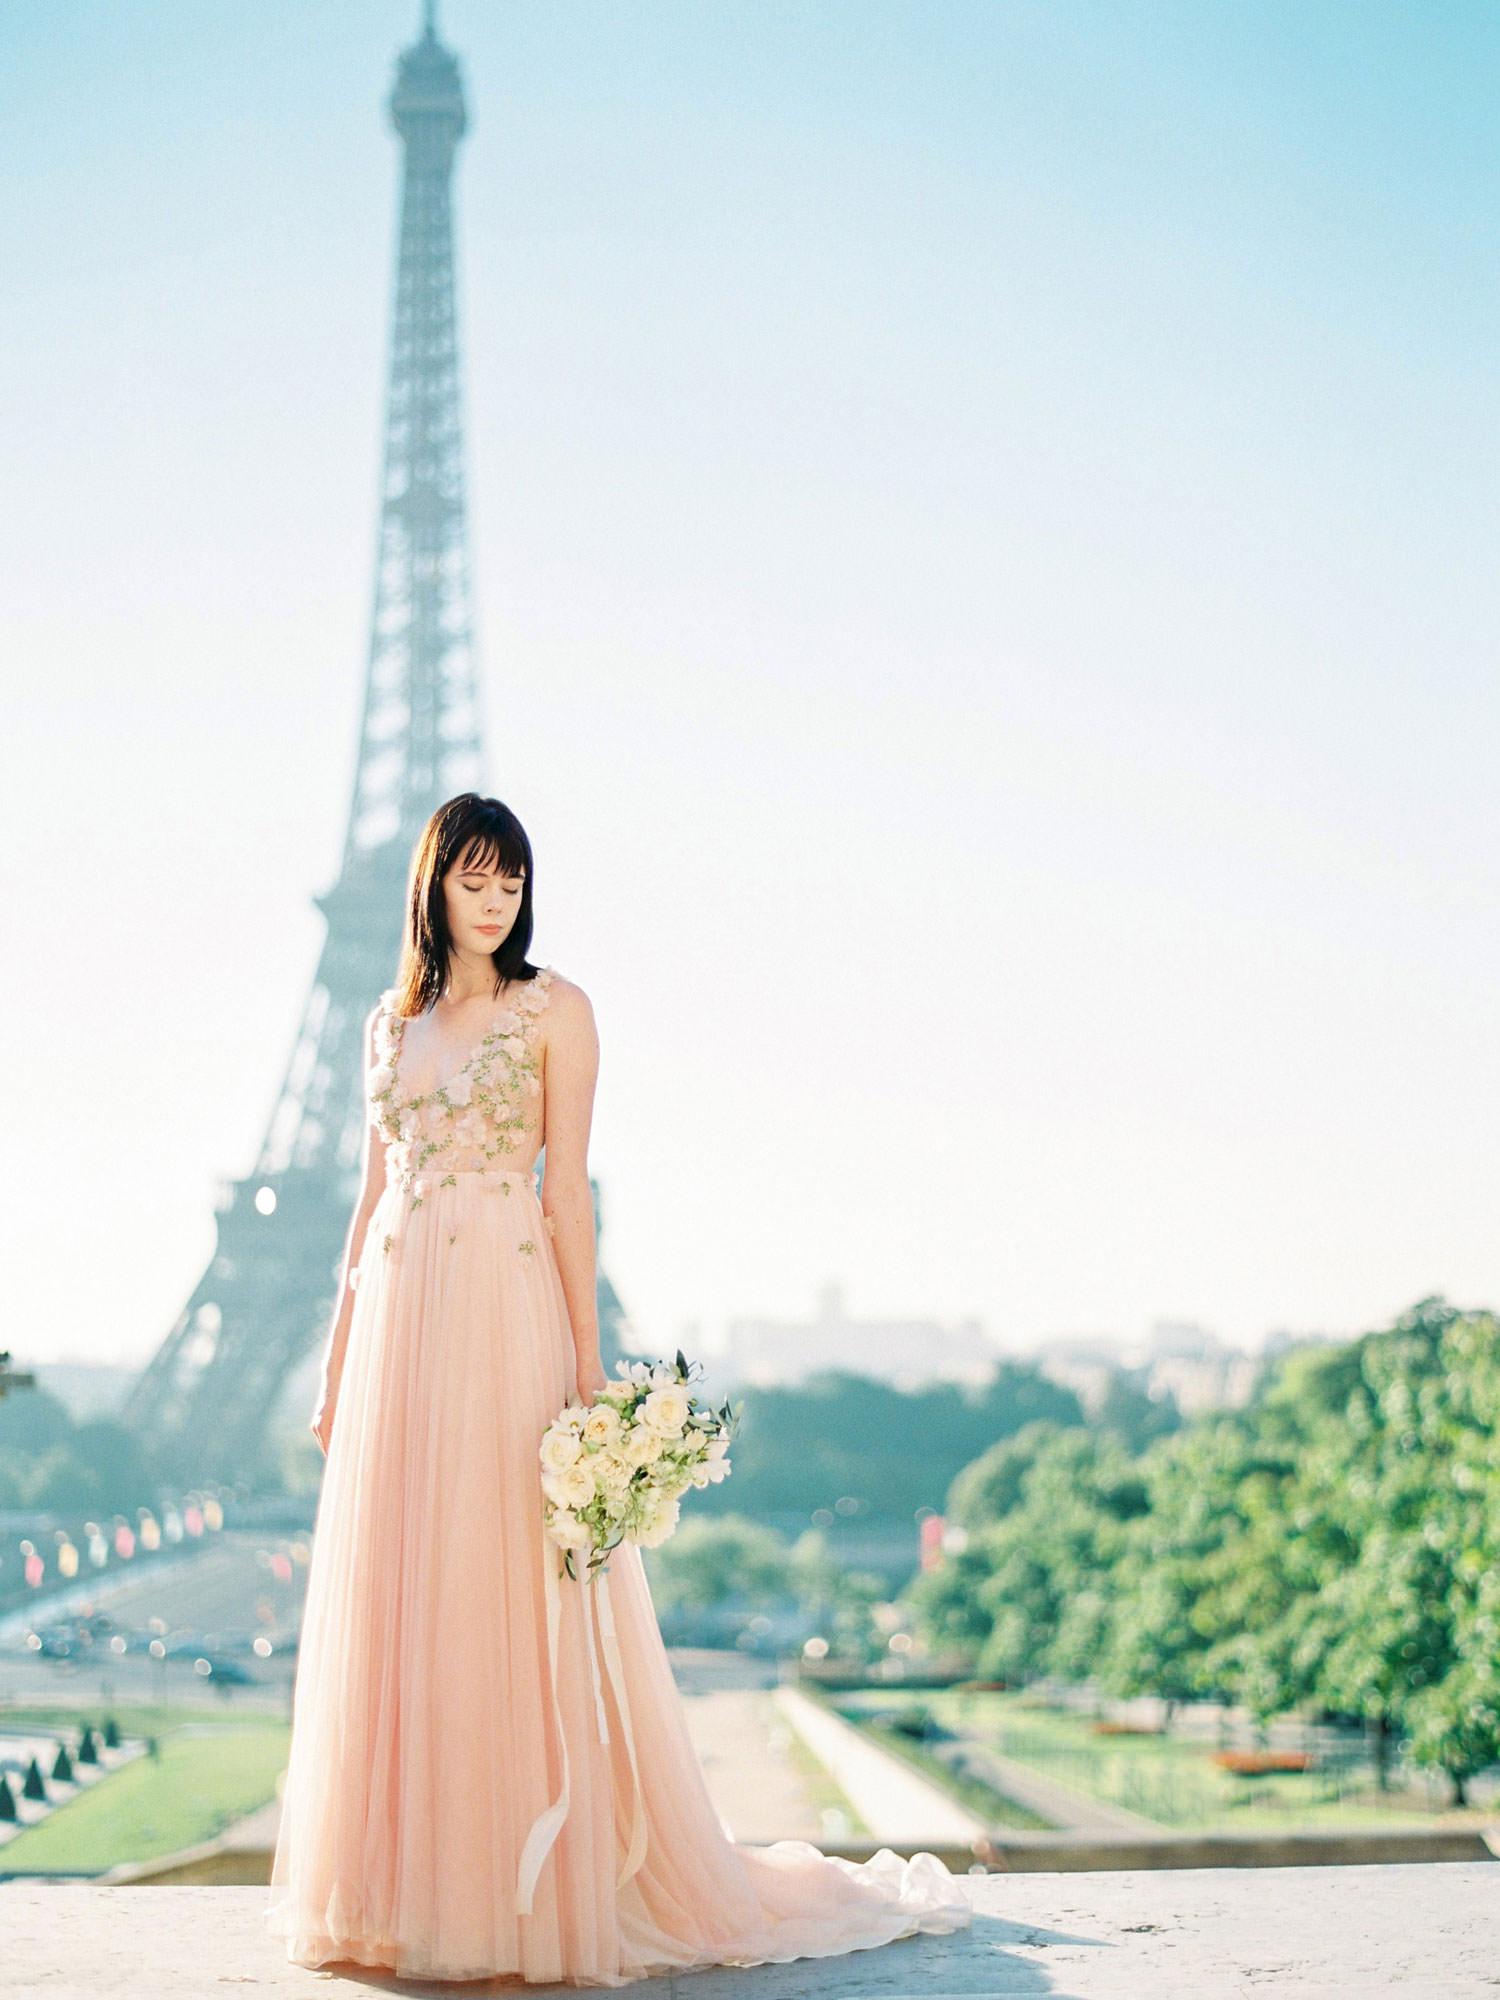 summer engagement shoot in paris -